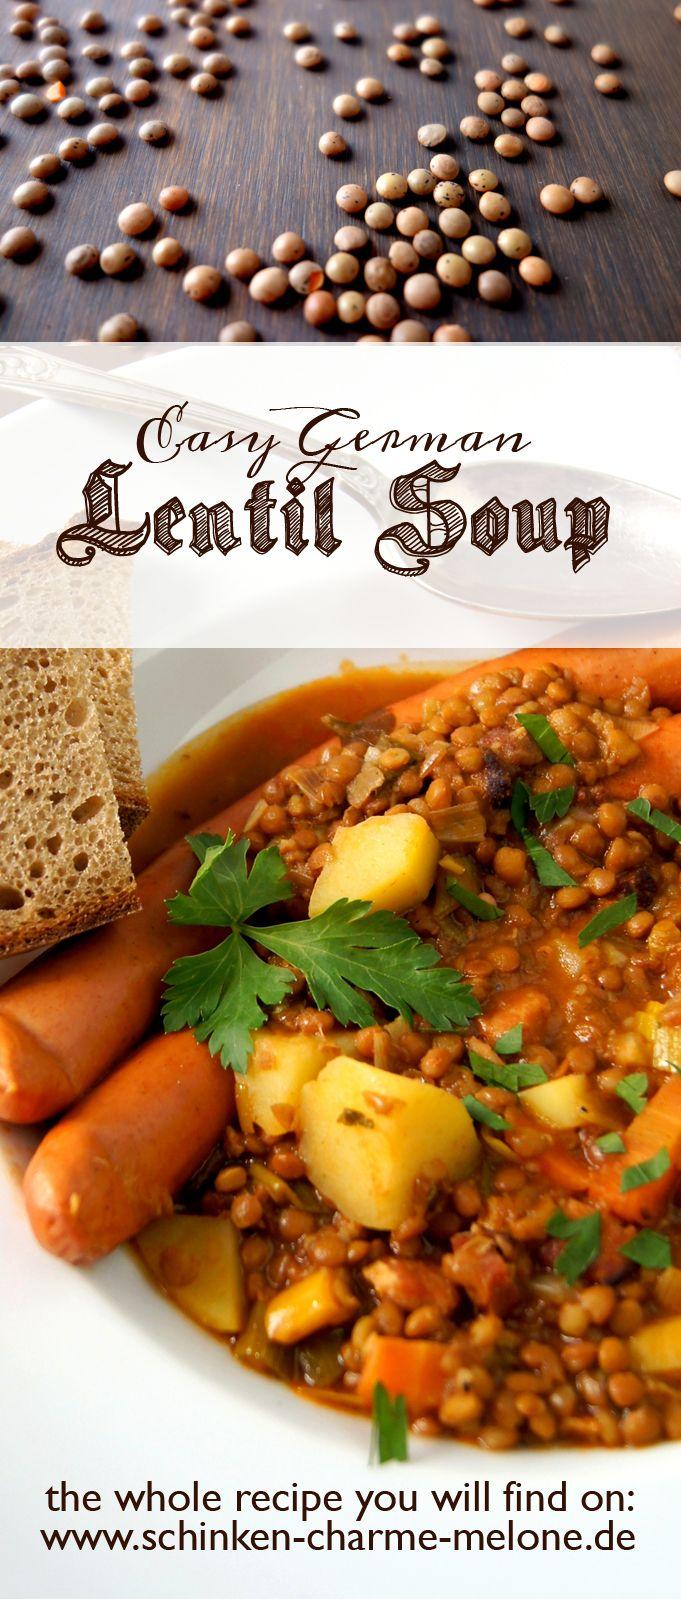 Mejores 23 imgenes de traditional german food recipes en pinterest german food our lentil soup recipe forumfinder Images